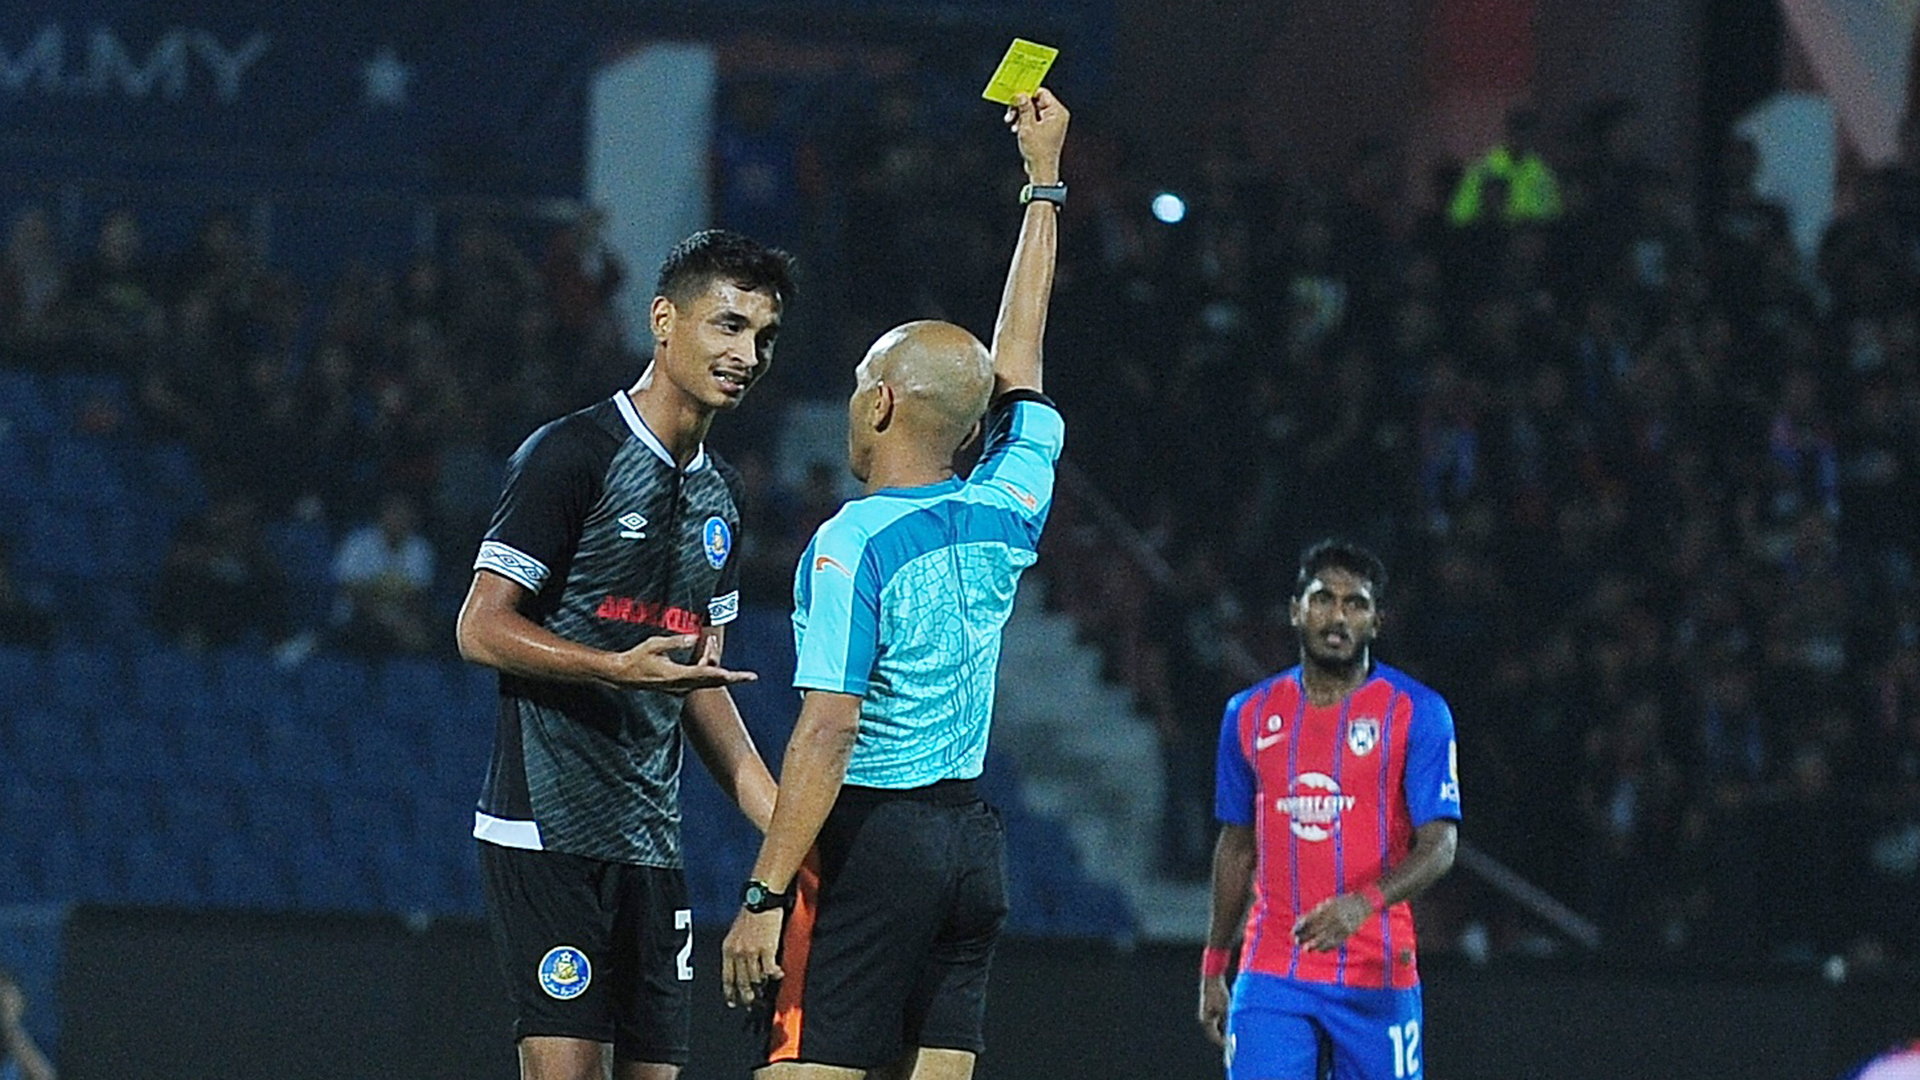 Safuwan Baharudin, Johor Darul Ta'zim v Pahang, Malaysia Super League, 14 May 2019